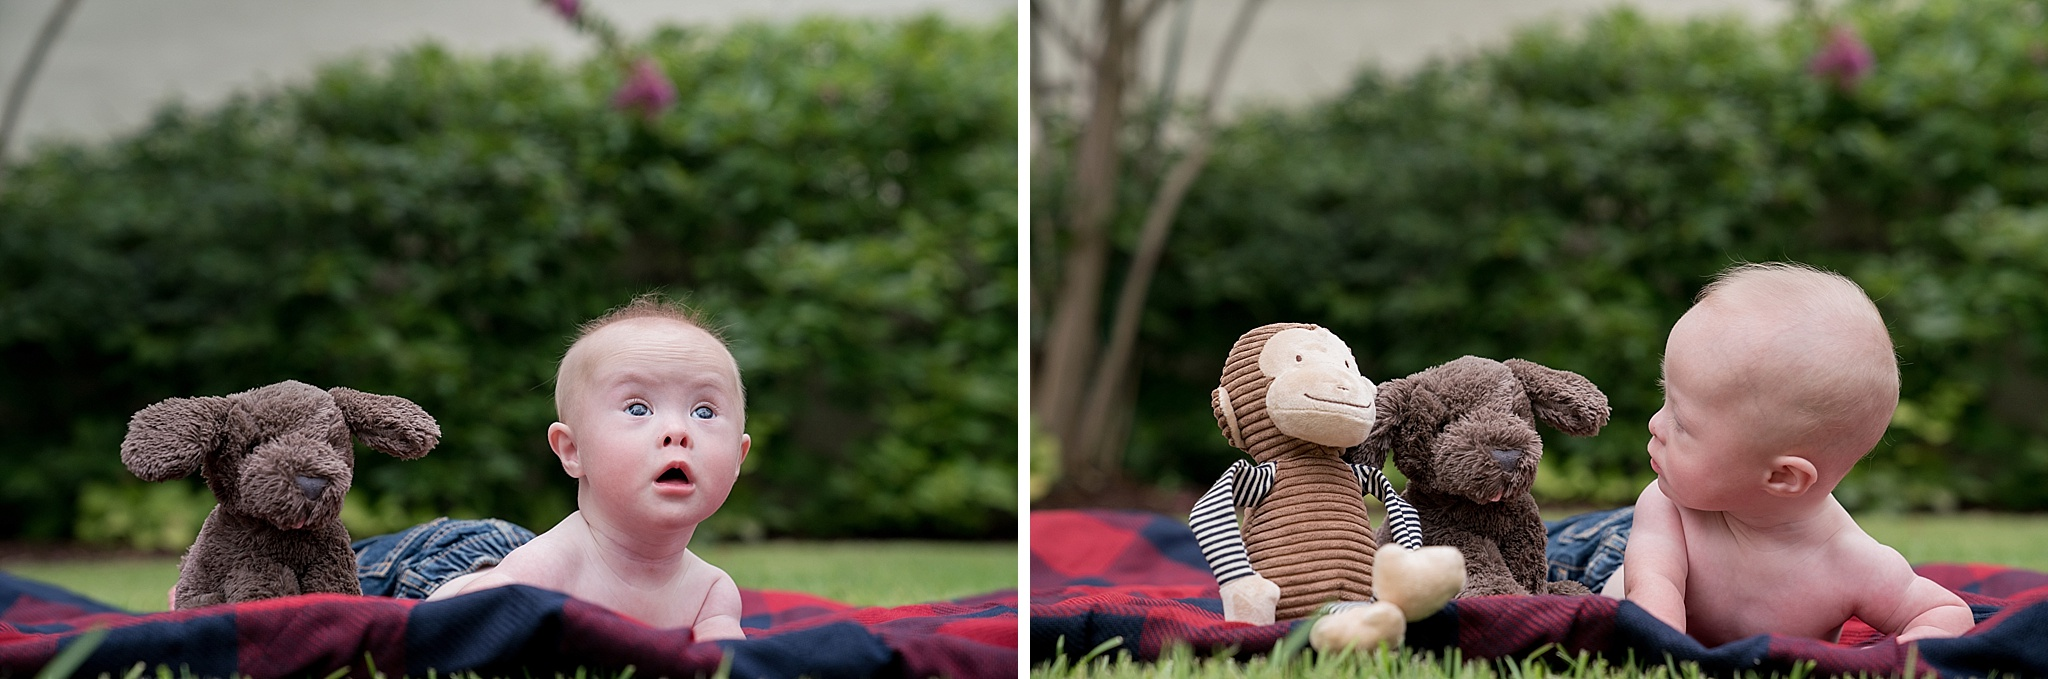 Greenville-NC-Children-Photographer-26.jpg